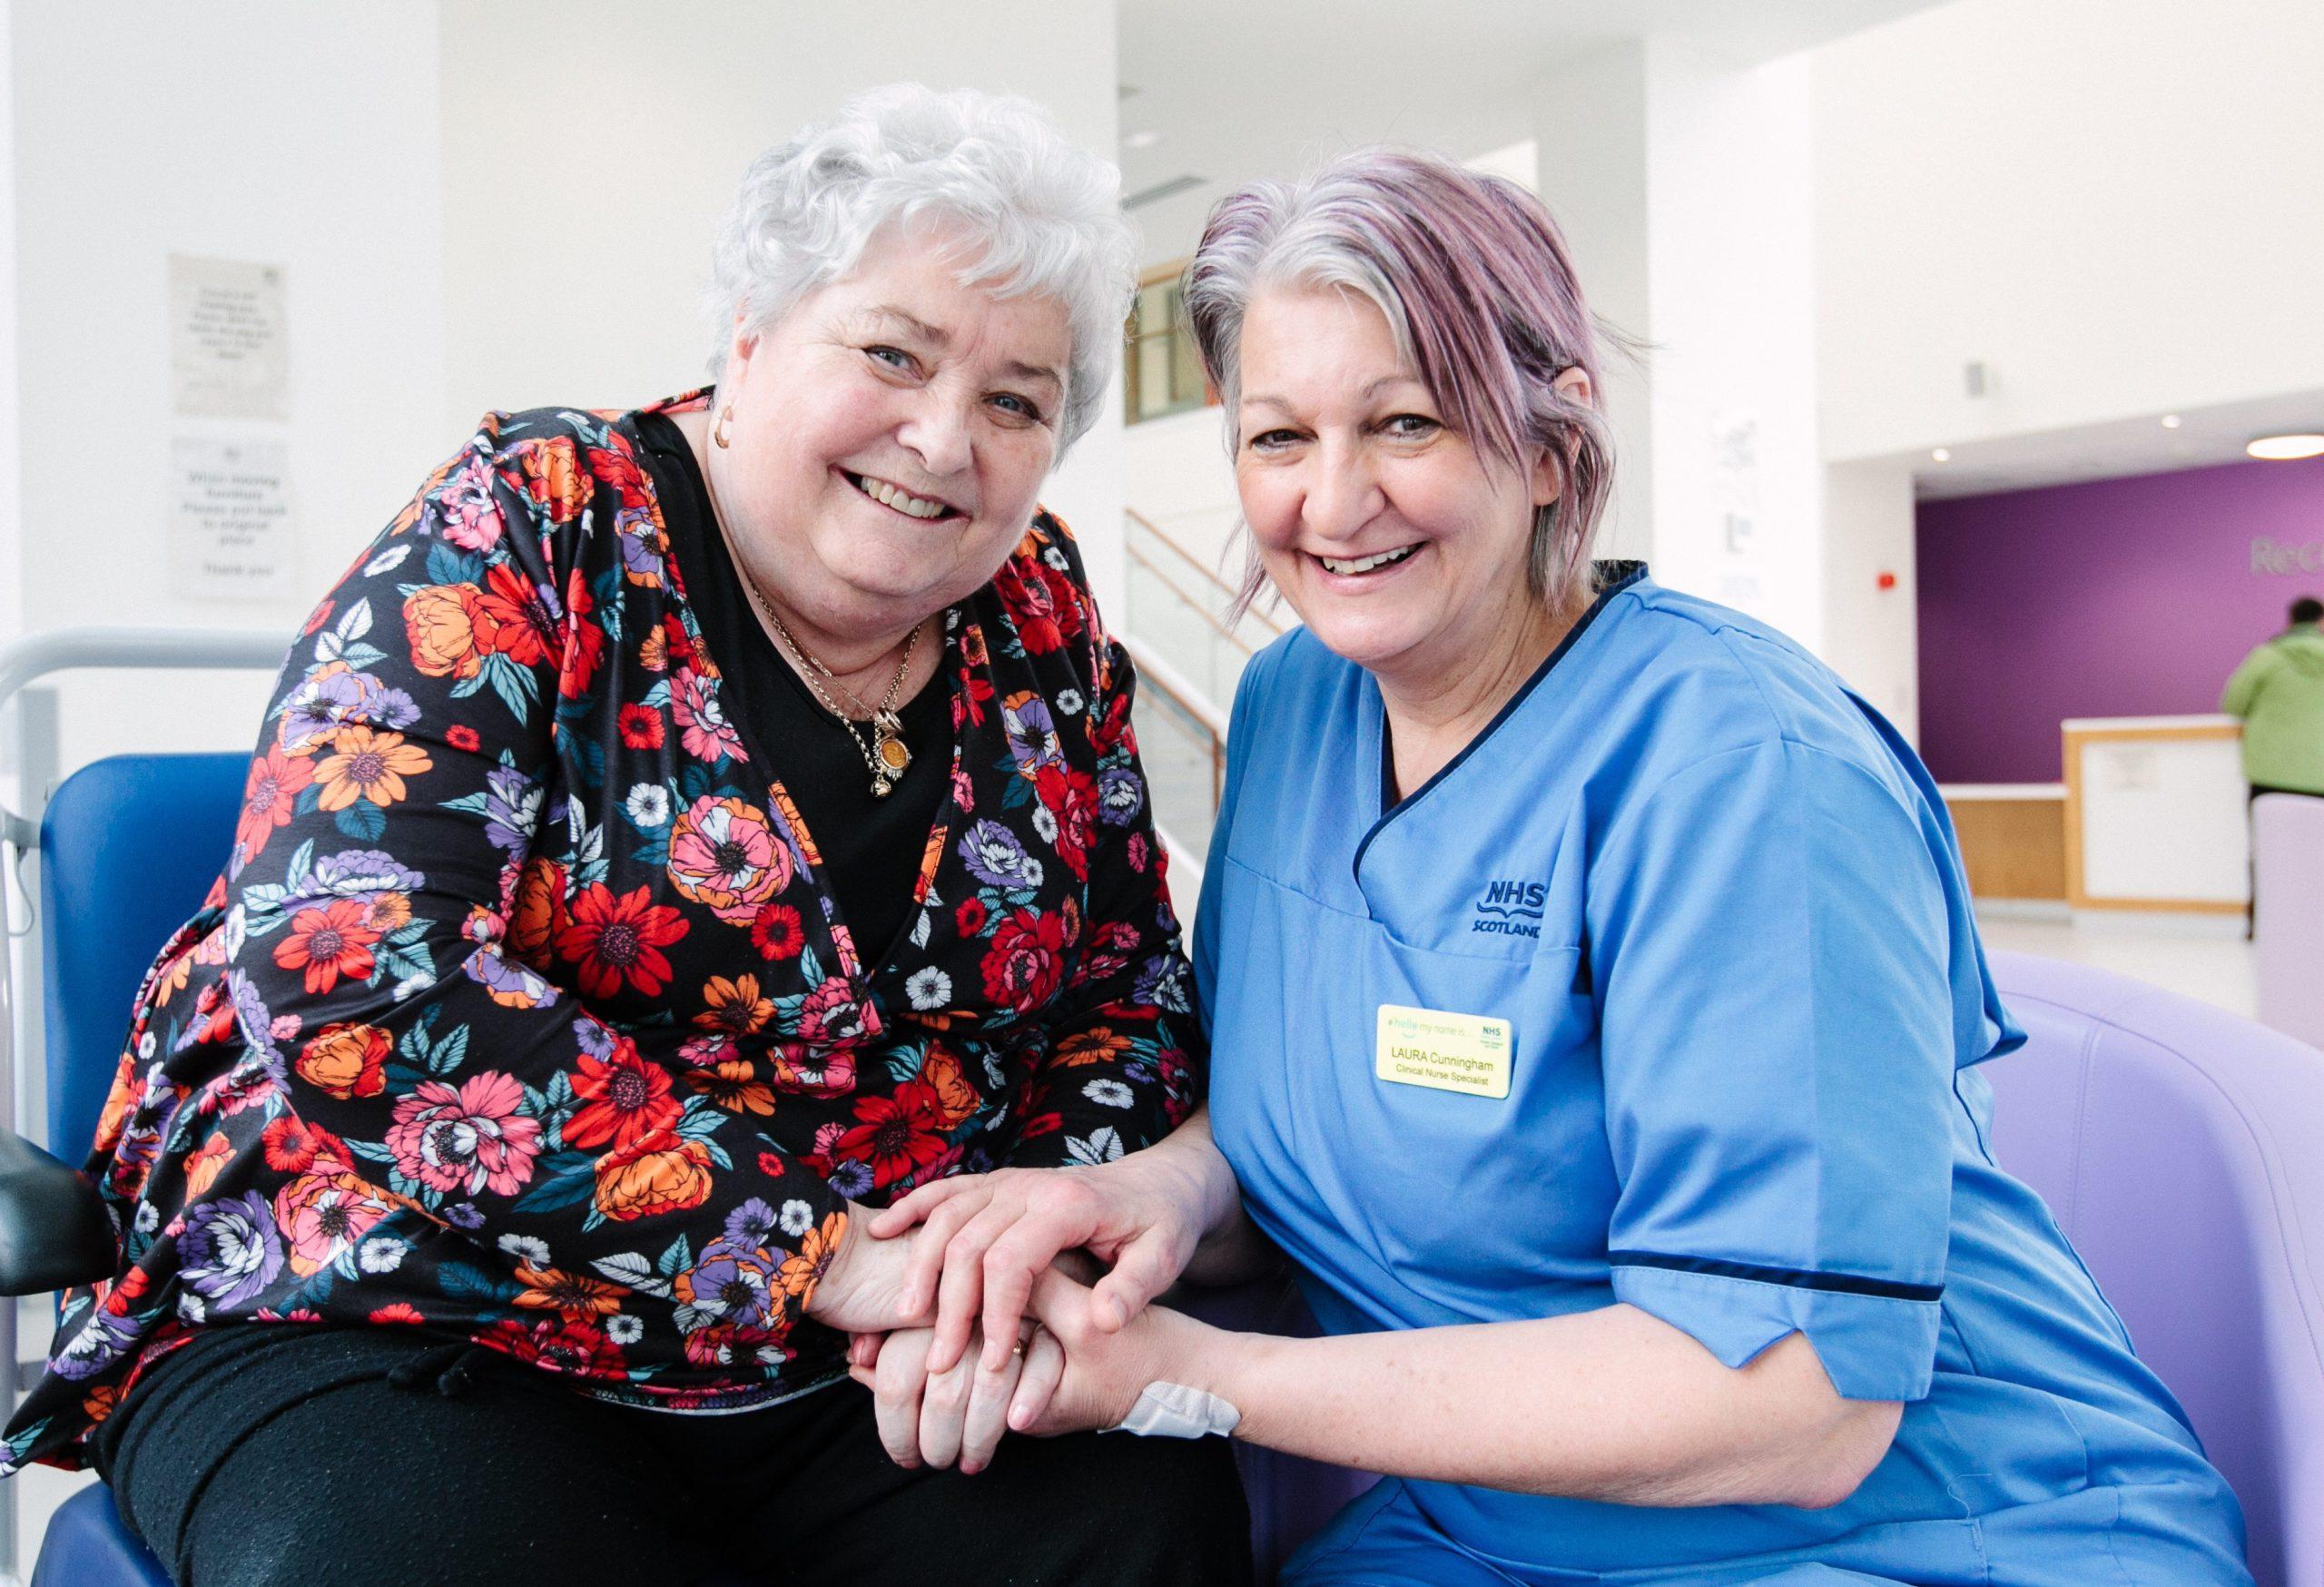 Joan Martin, 74, with nurse Laura Cunningham at Queen Elizabeth University Hospital in Glasgow